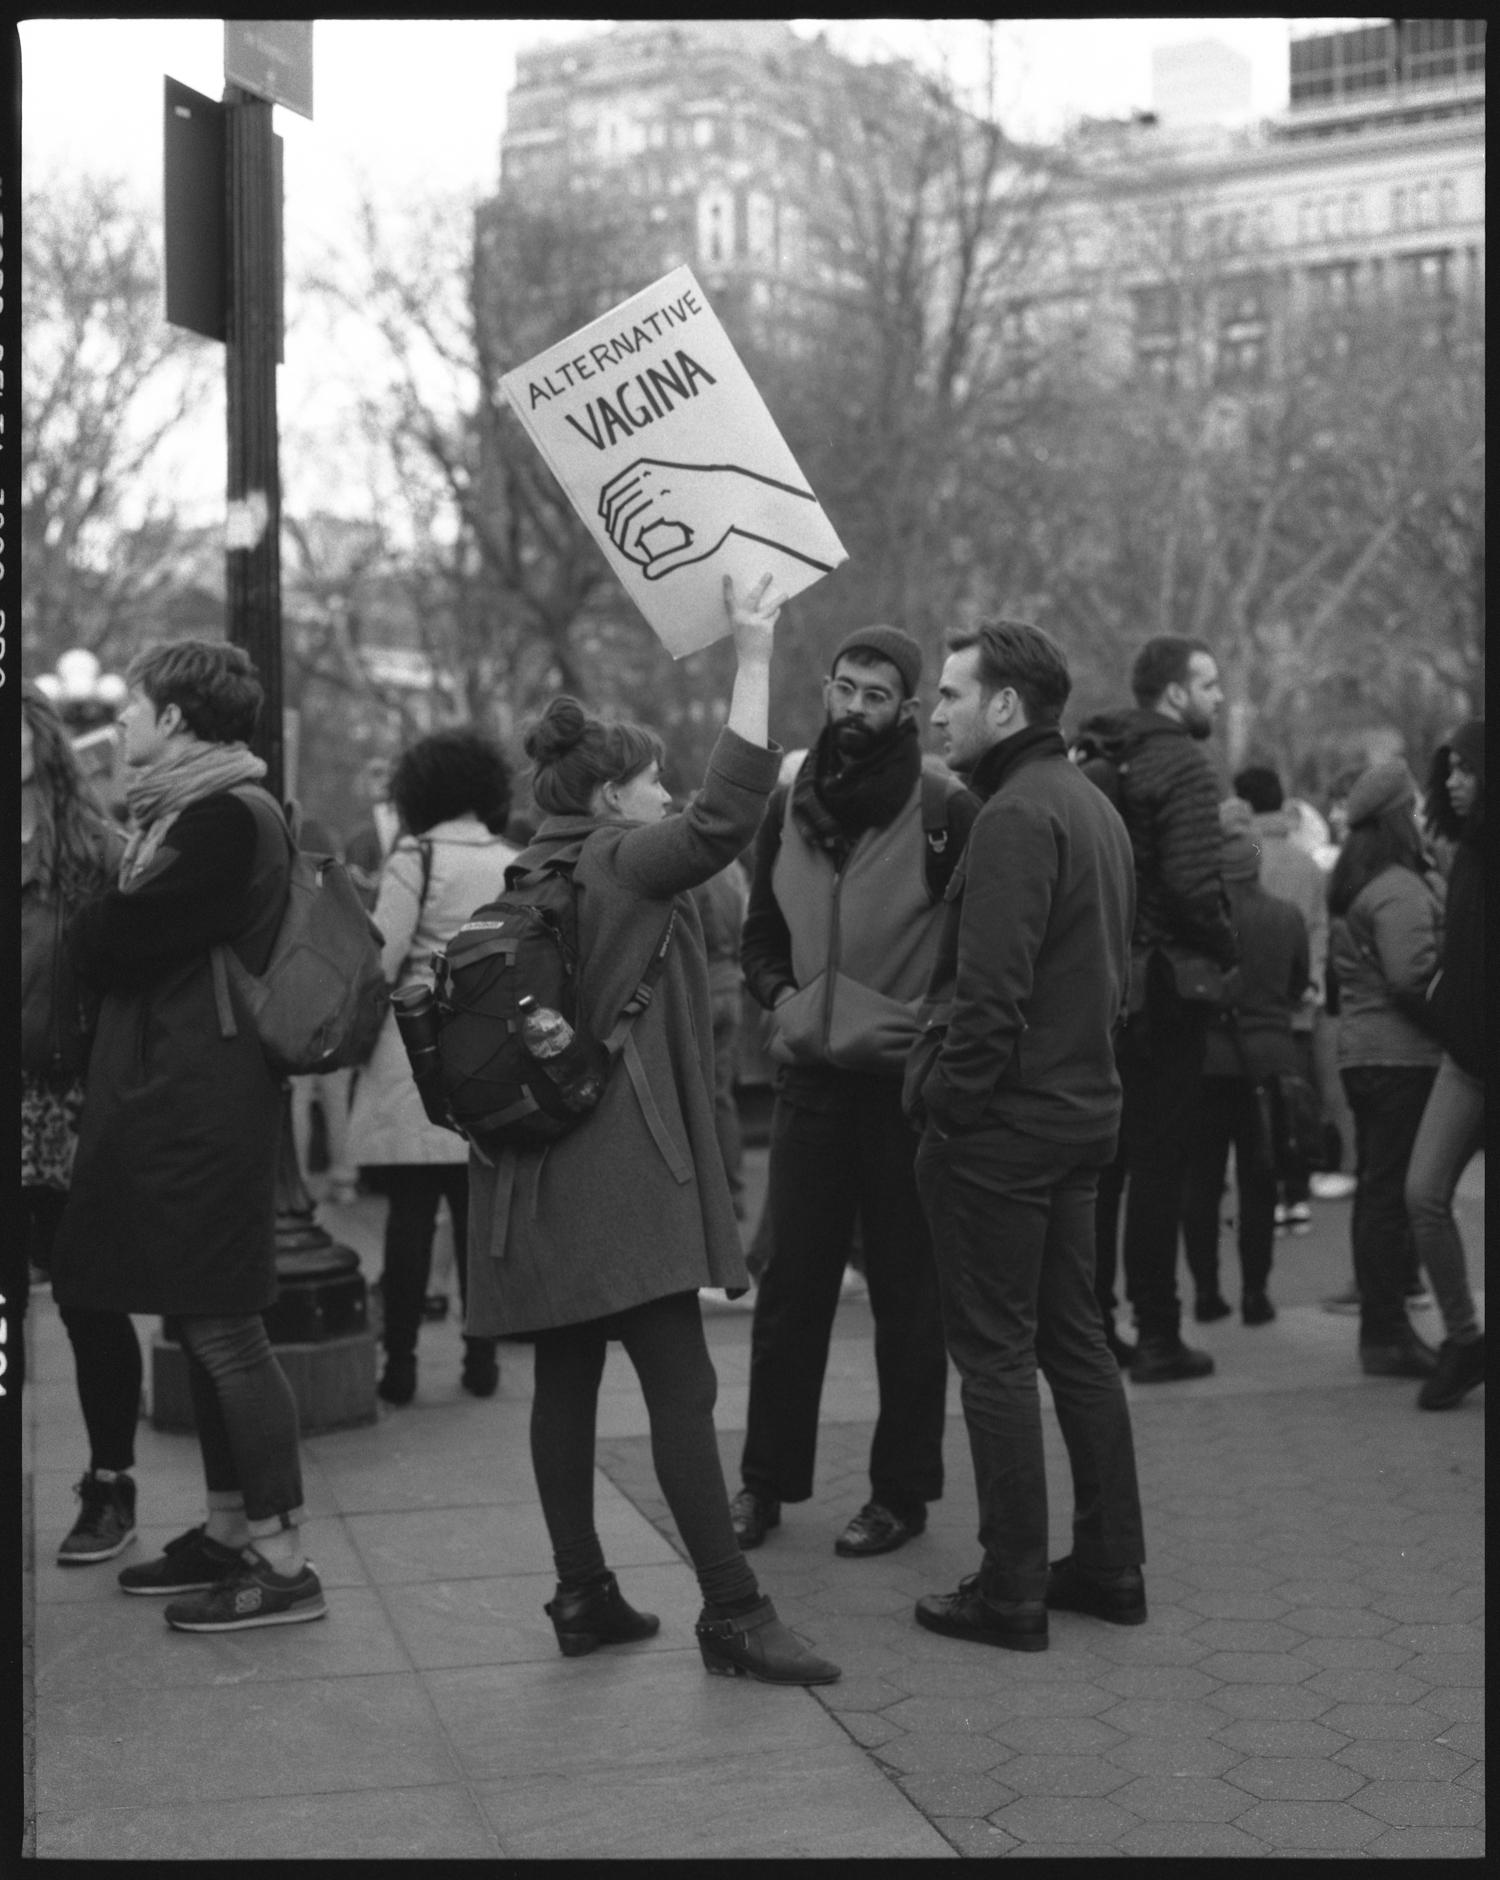 amber_mahoney_the_resistance_international_women's_day_new_york_002.jpg